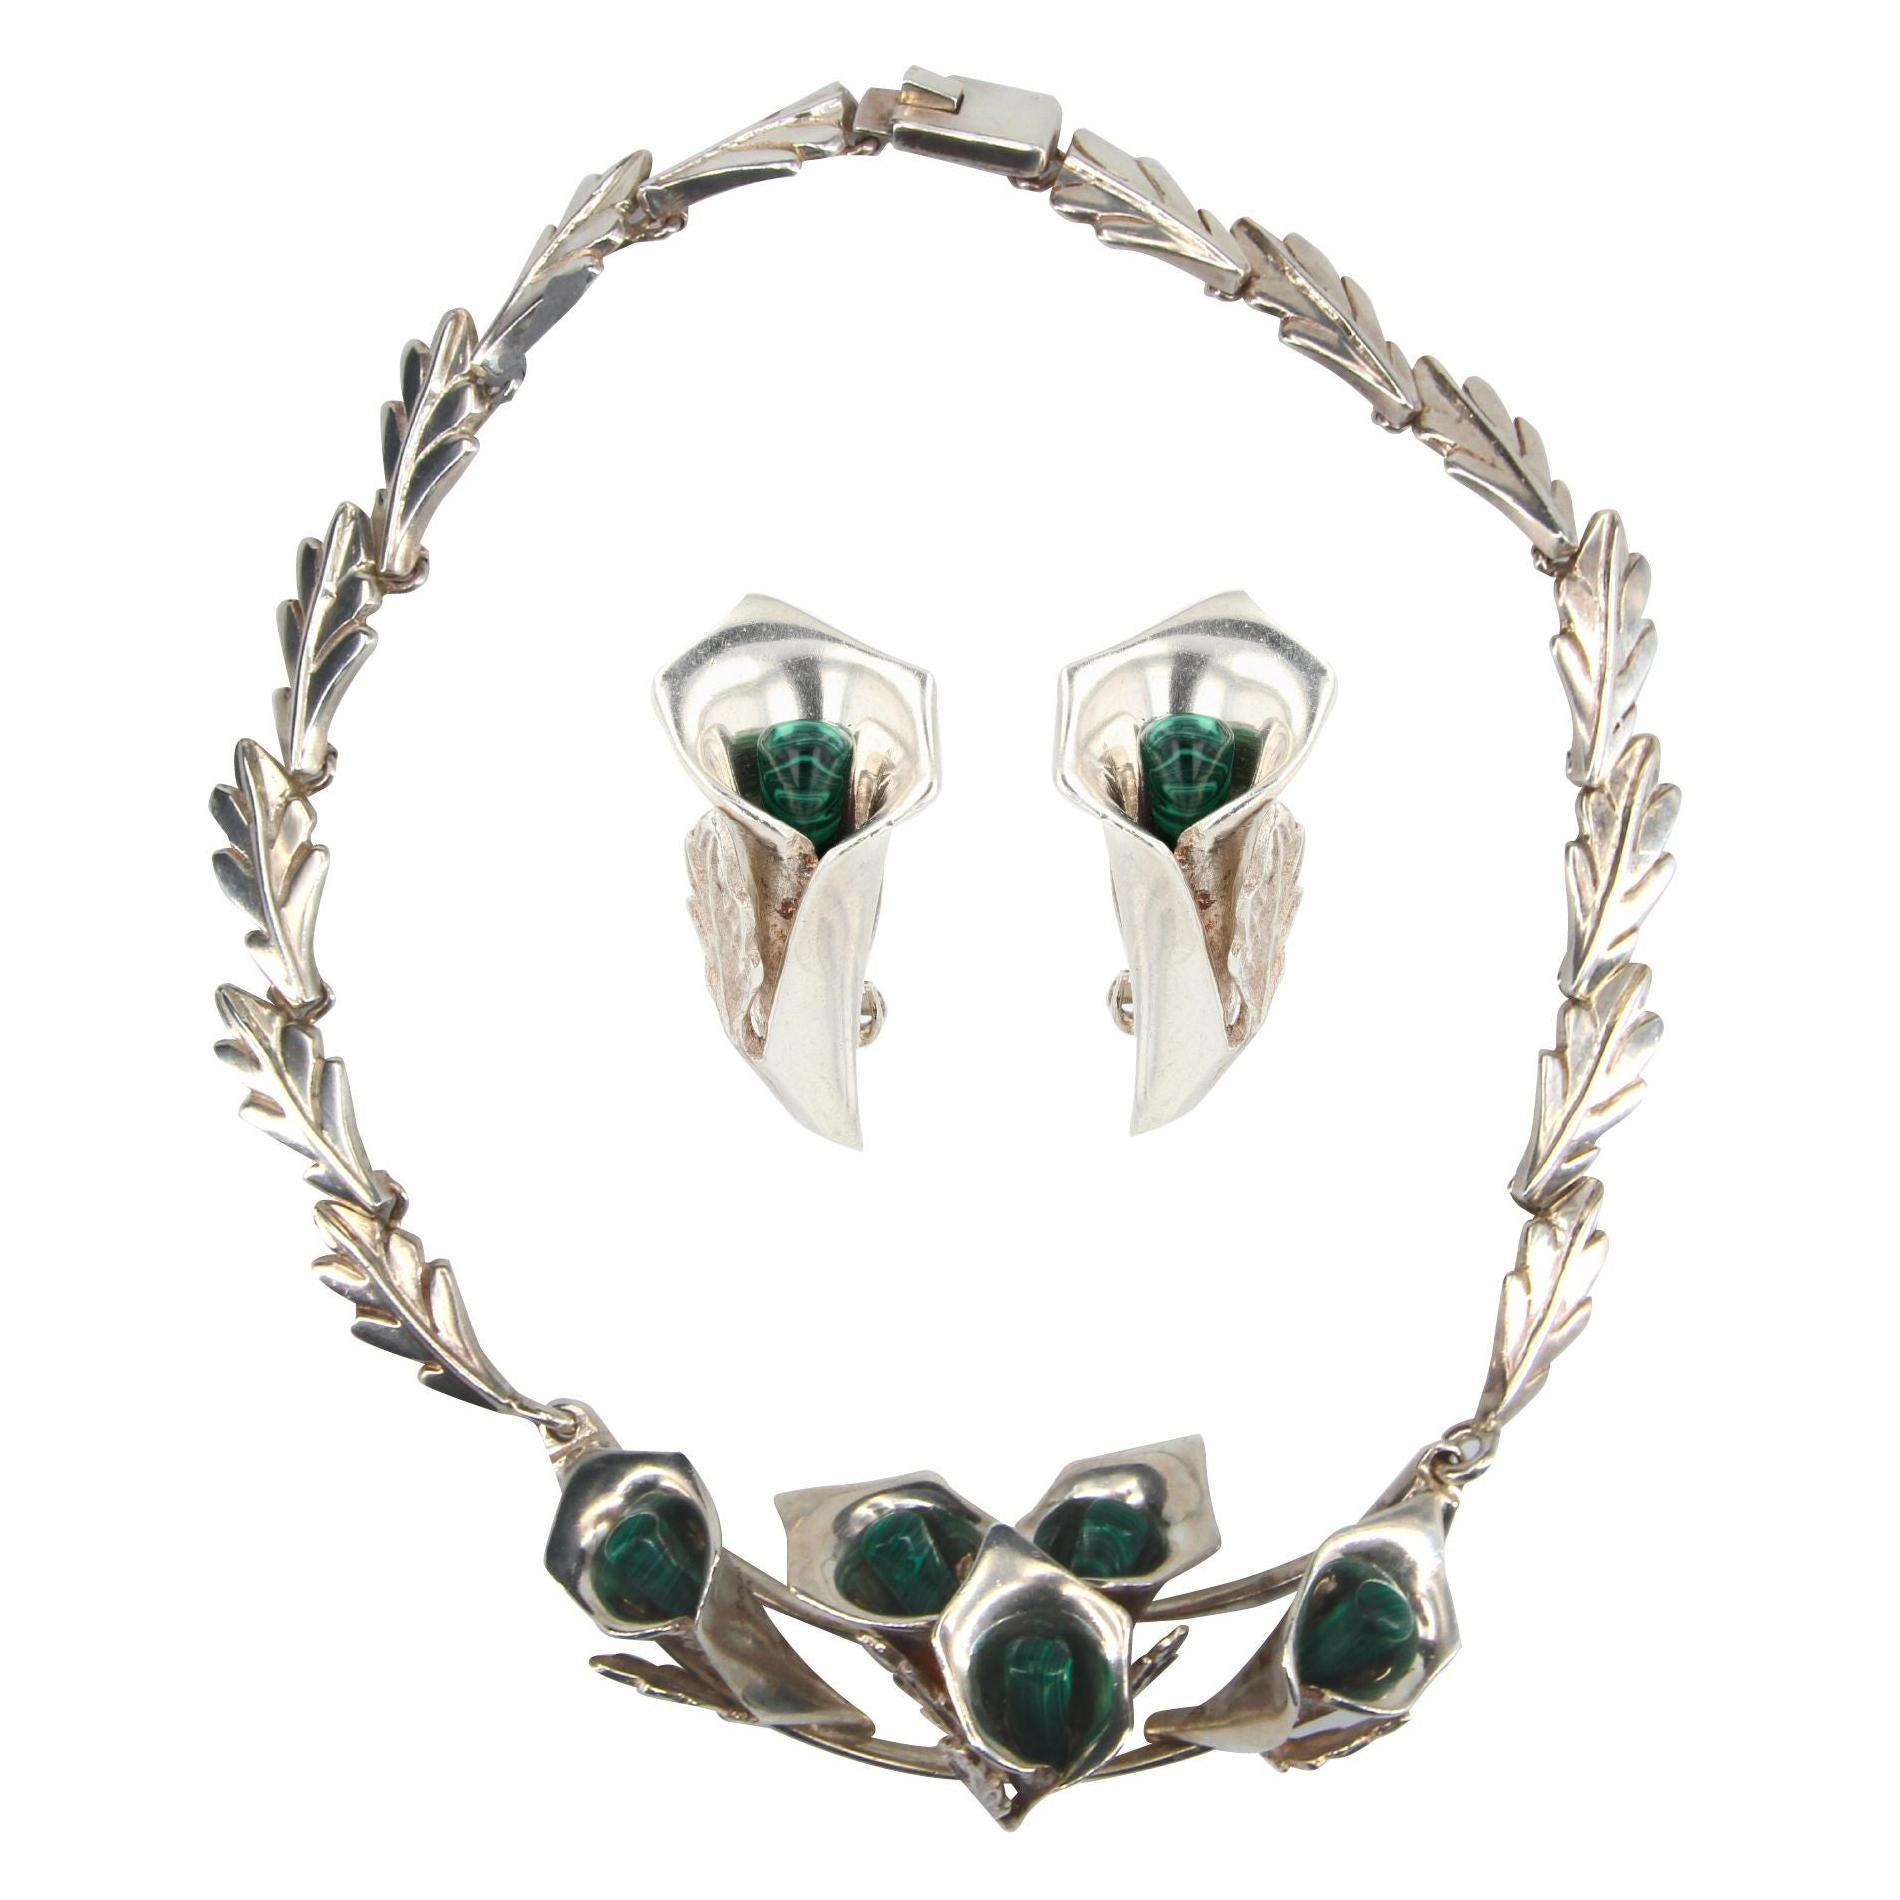 1970s Malachite Sterling Silver Necklace Earrings Set